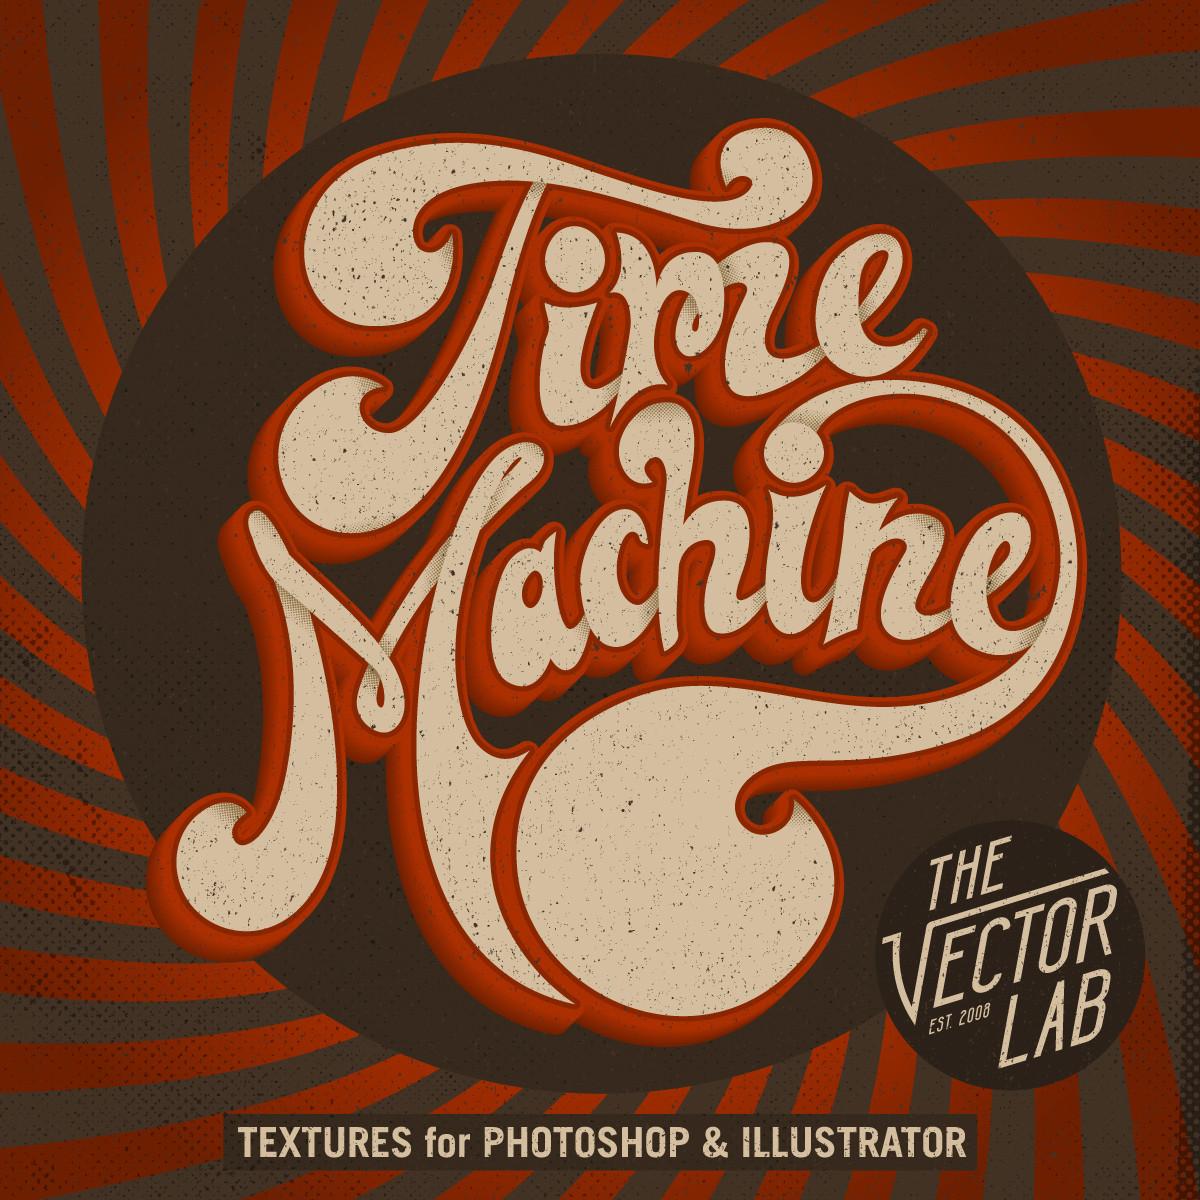 TIME-MACHINE-TEXTURES-01.jpg